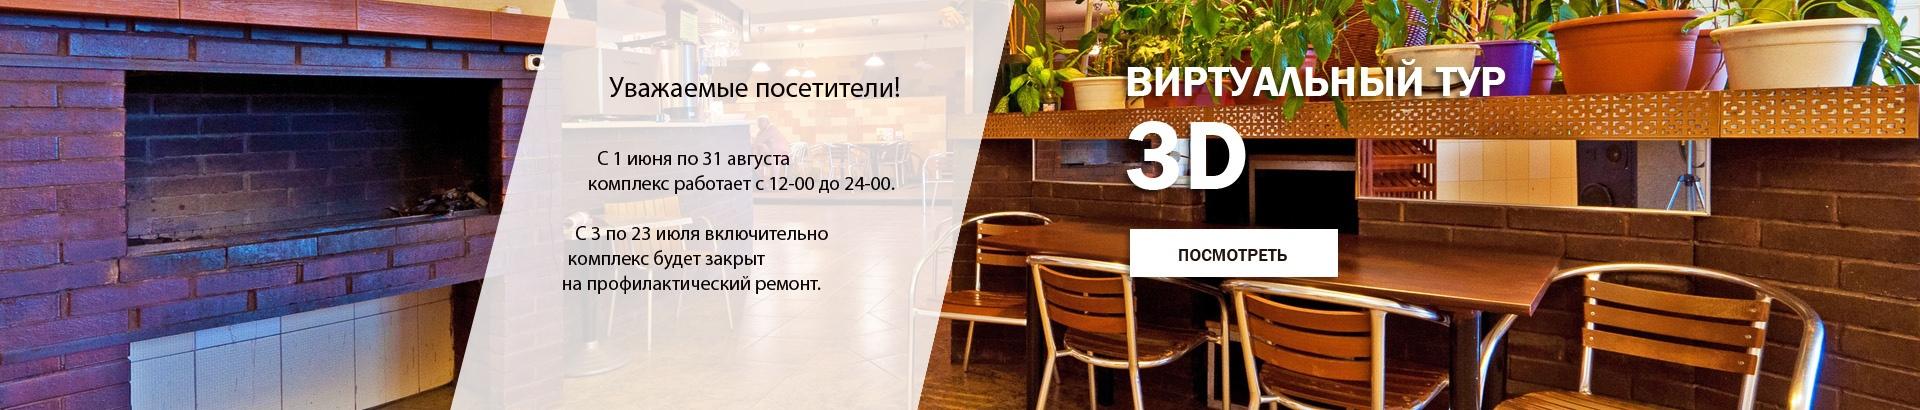 Прожиточный минимум пенсионера на 2016 год москва